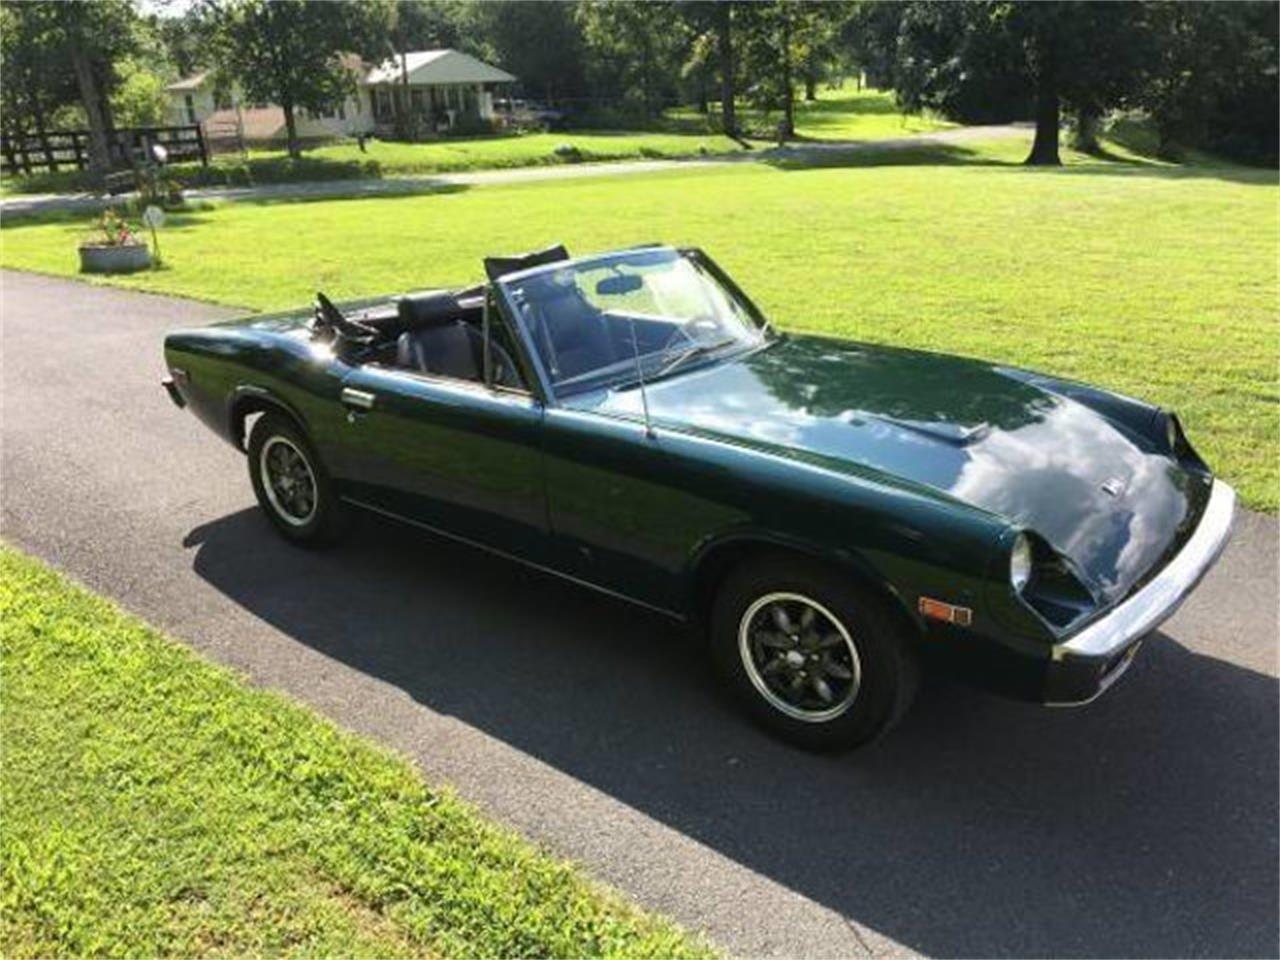 1974 Jensen-Healey Healey Roadster (CC-1255203) for sale in Long Island, New York